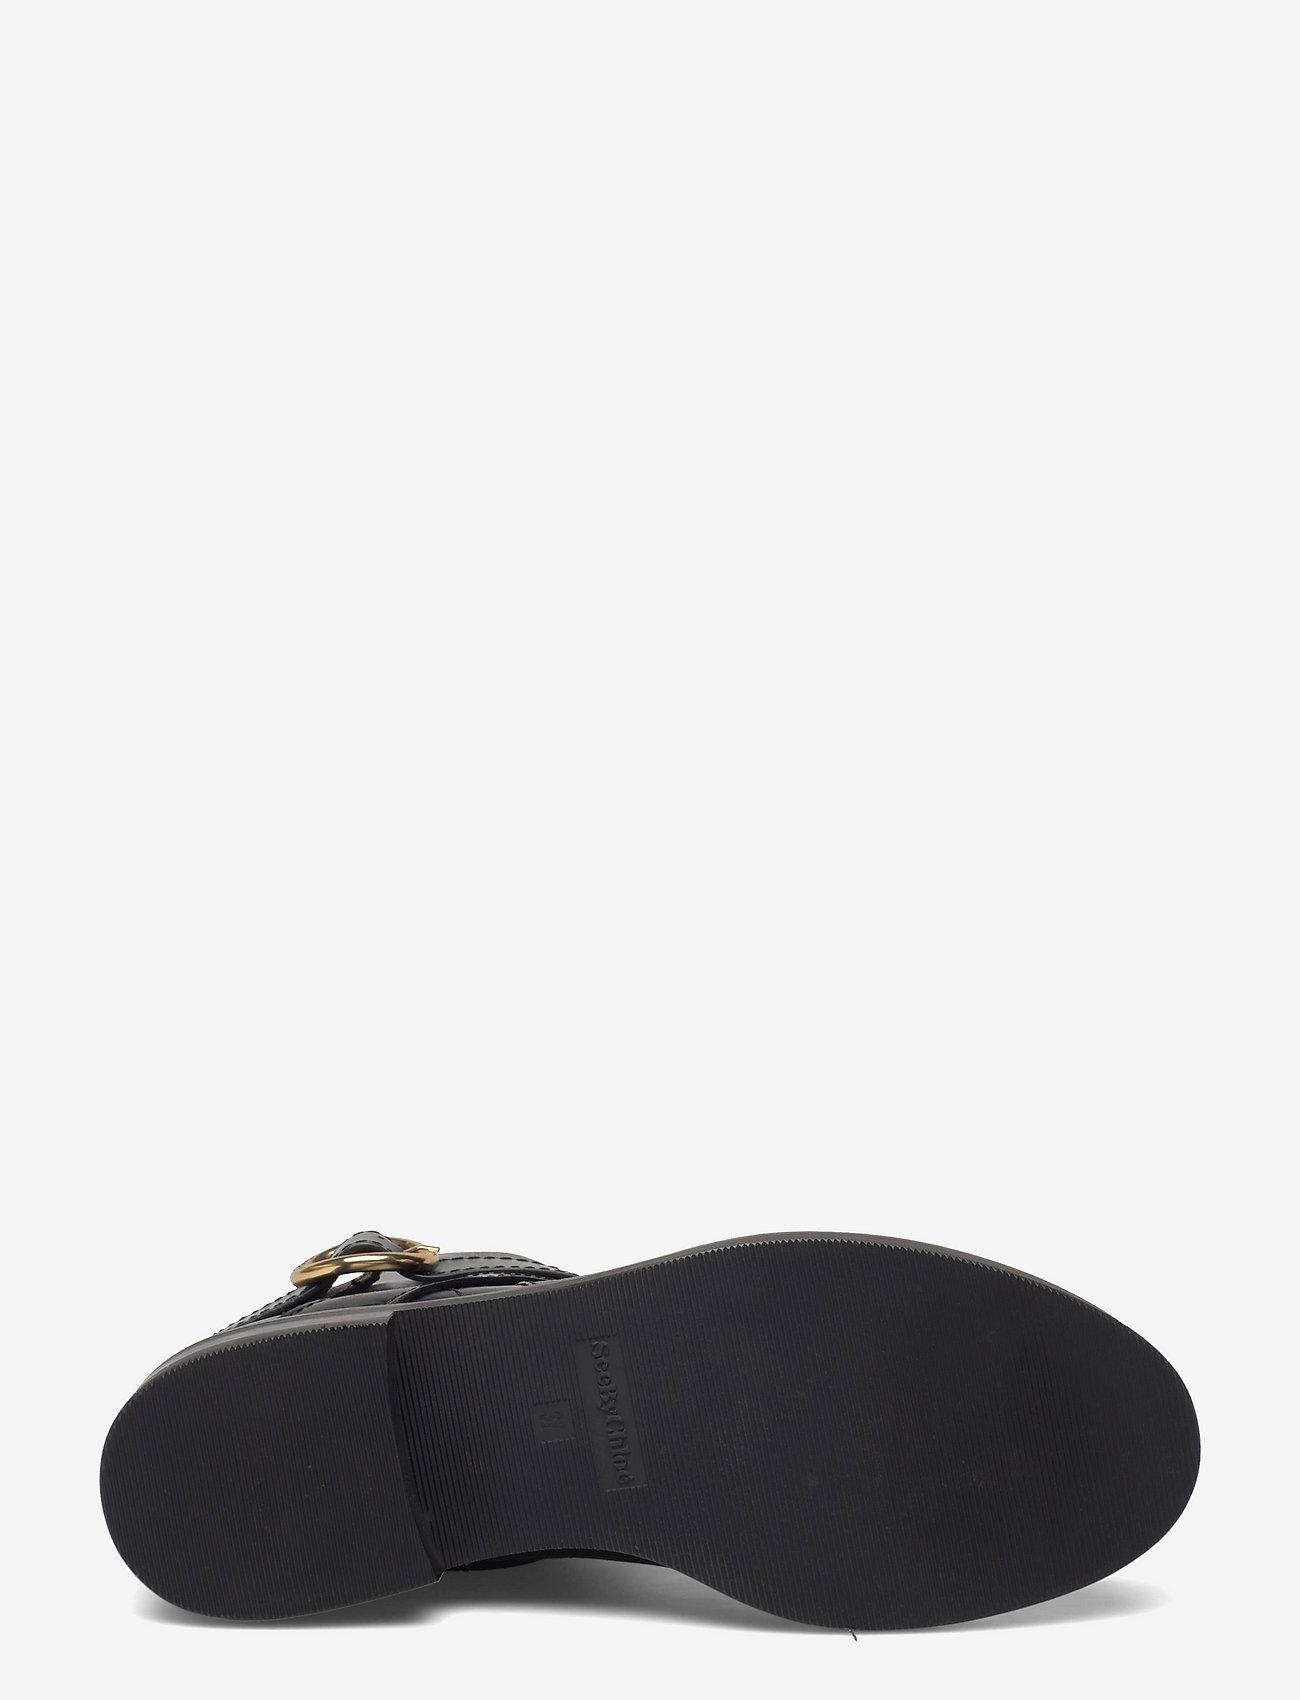 See by Chloé - FLAT ANKLE BOOTS - flate ankelstøvletter - black - 4